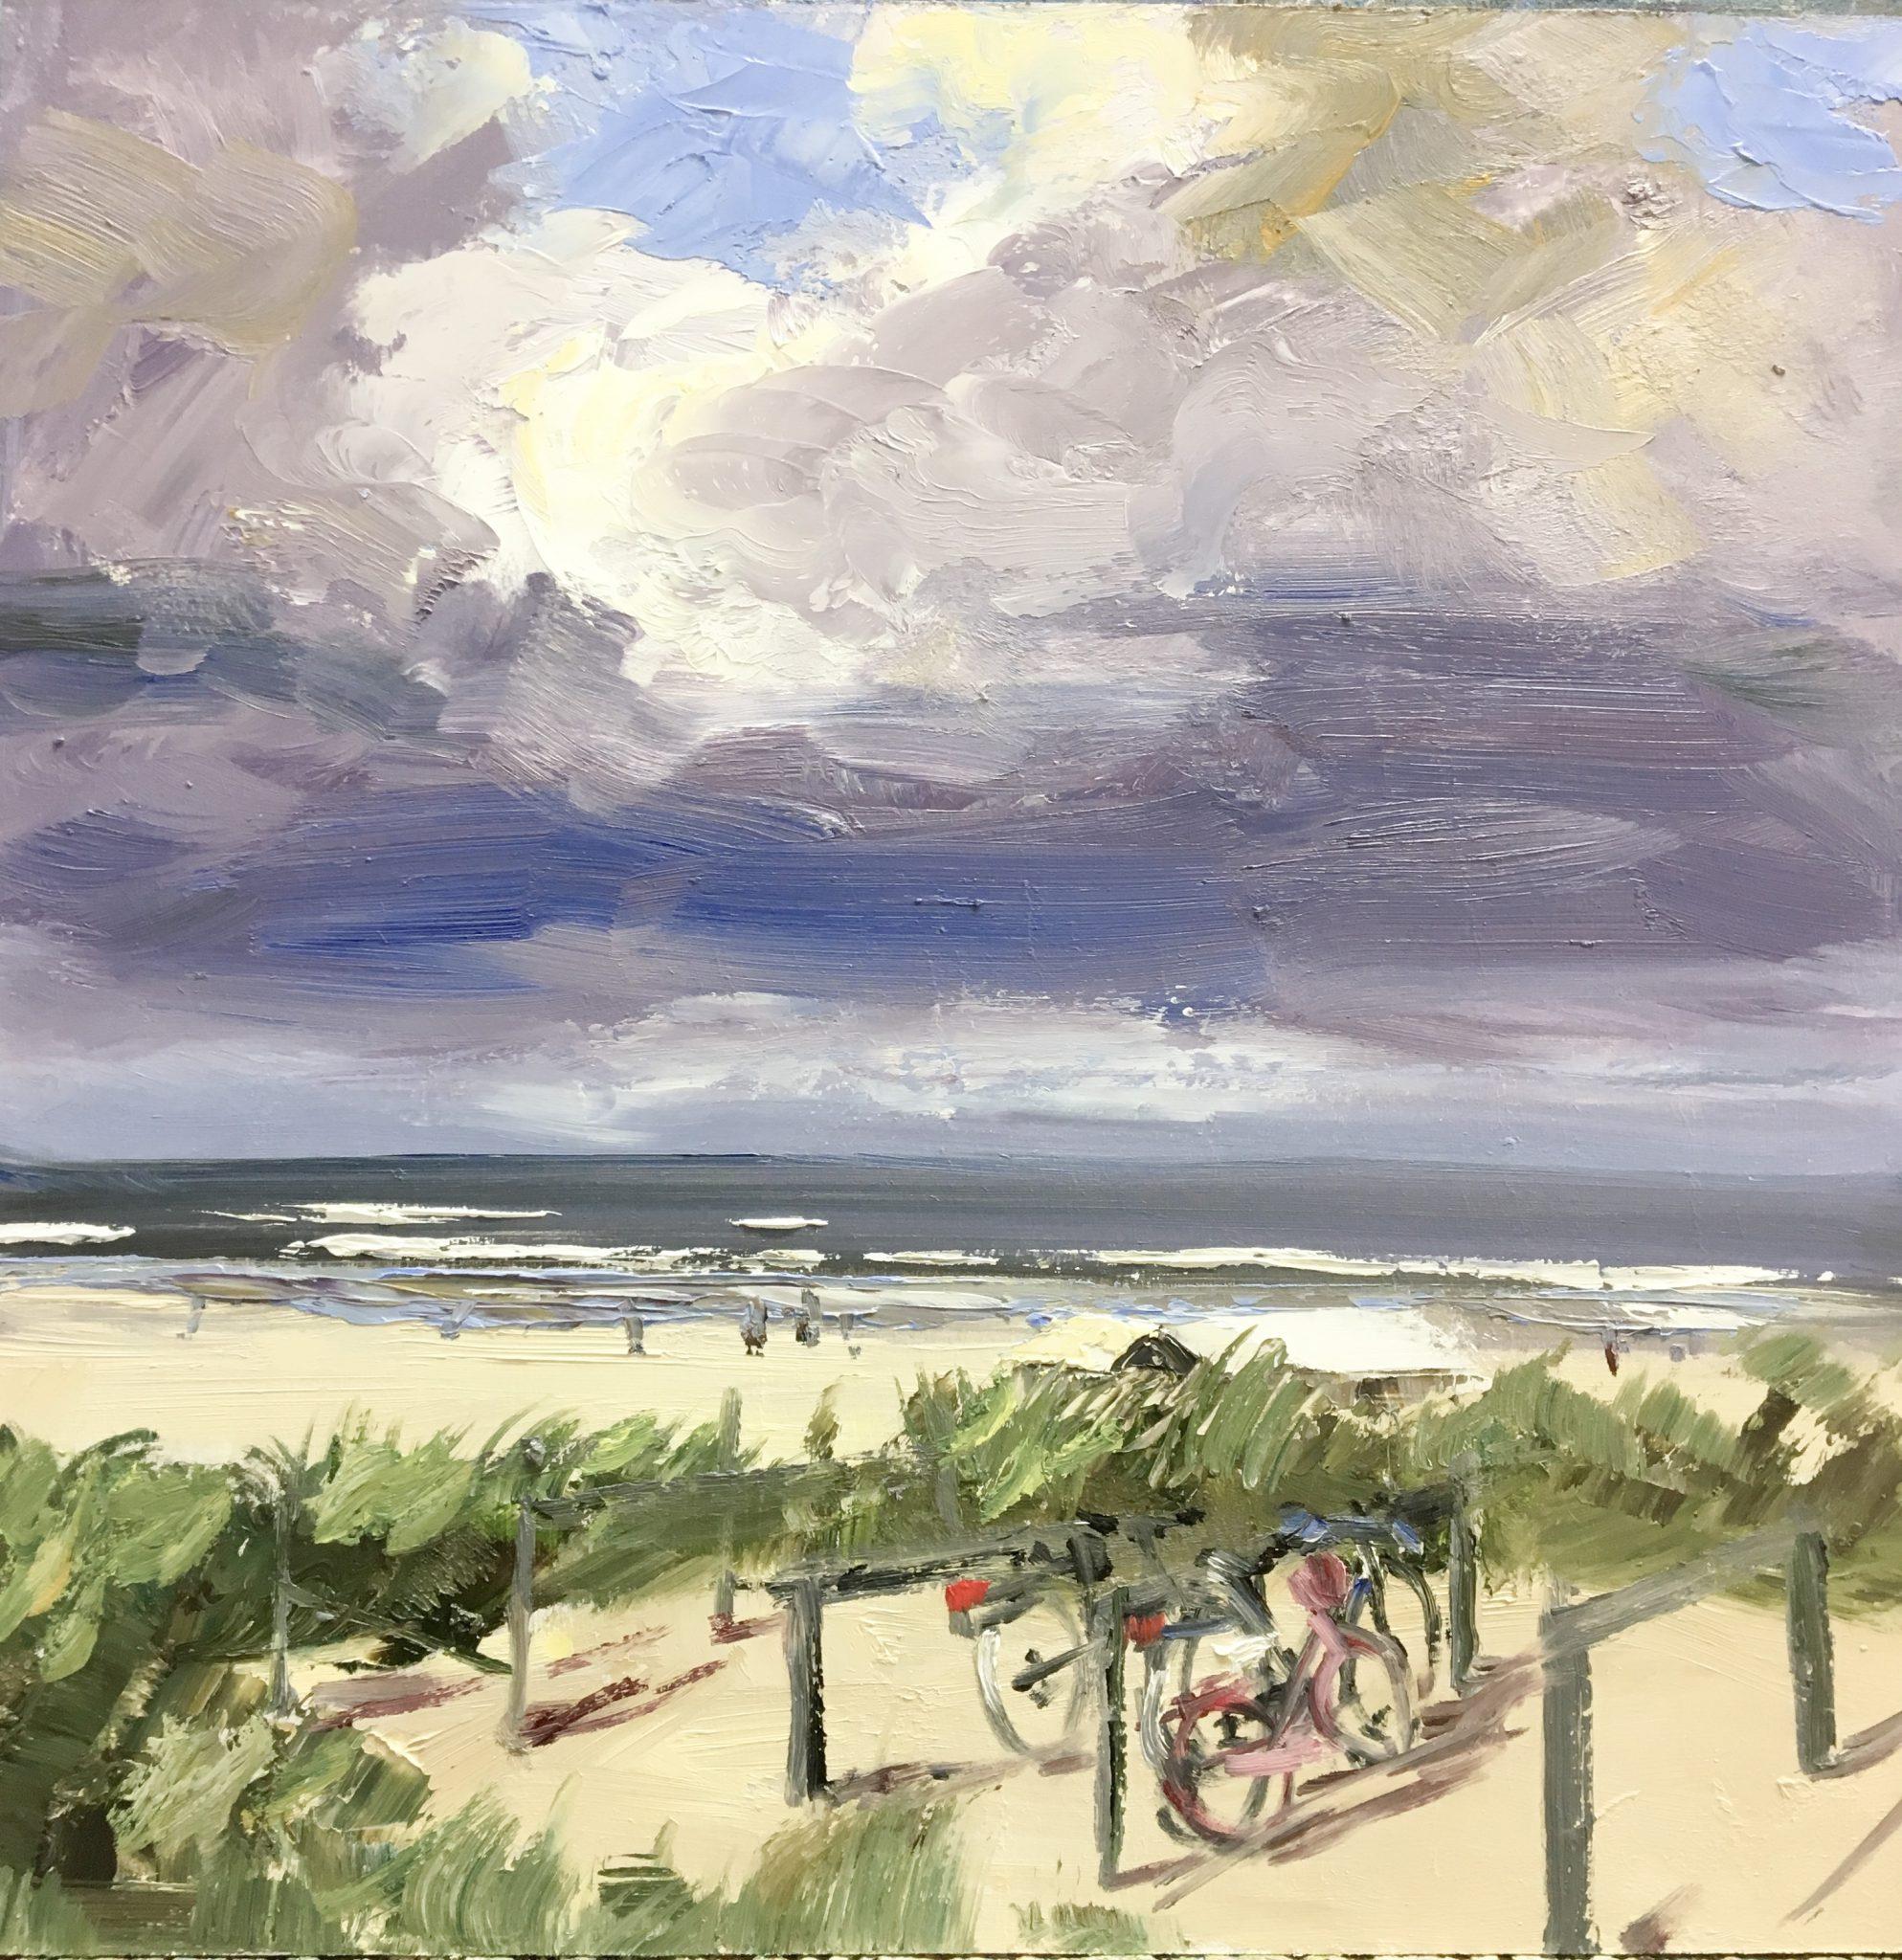 strand- fietsen- strandopgang-kijkduin-van Lynden-olieverf-schilderij